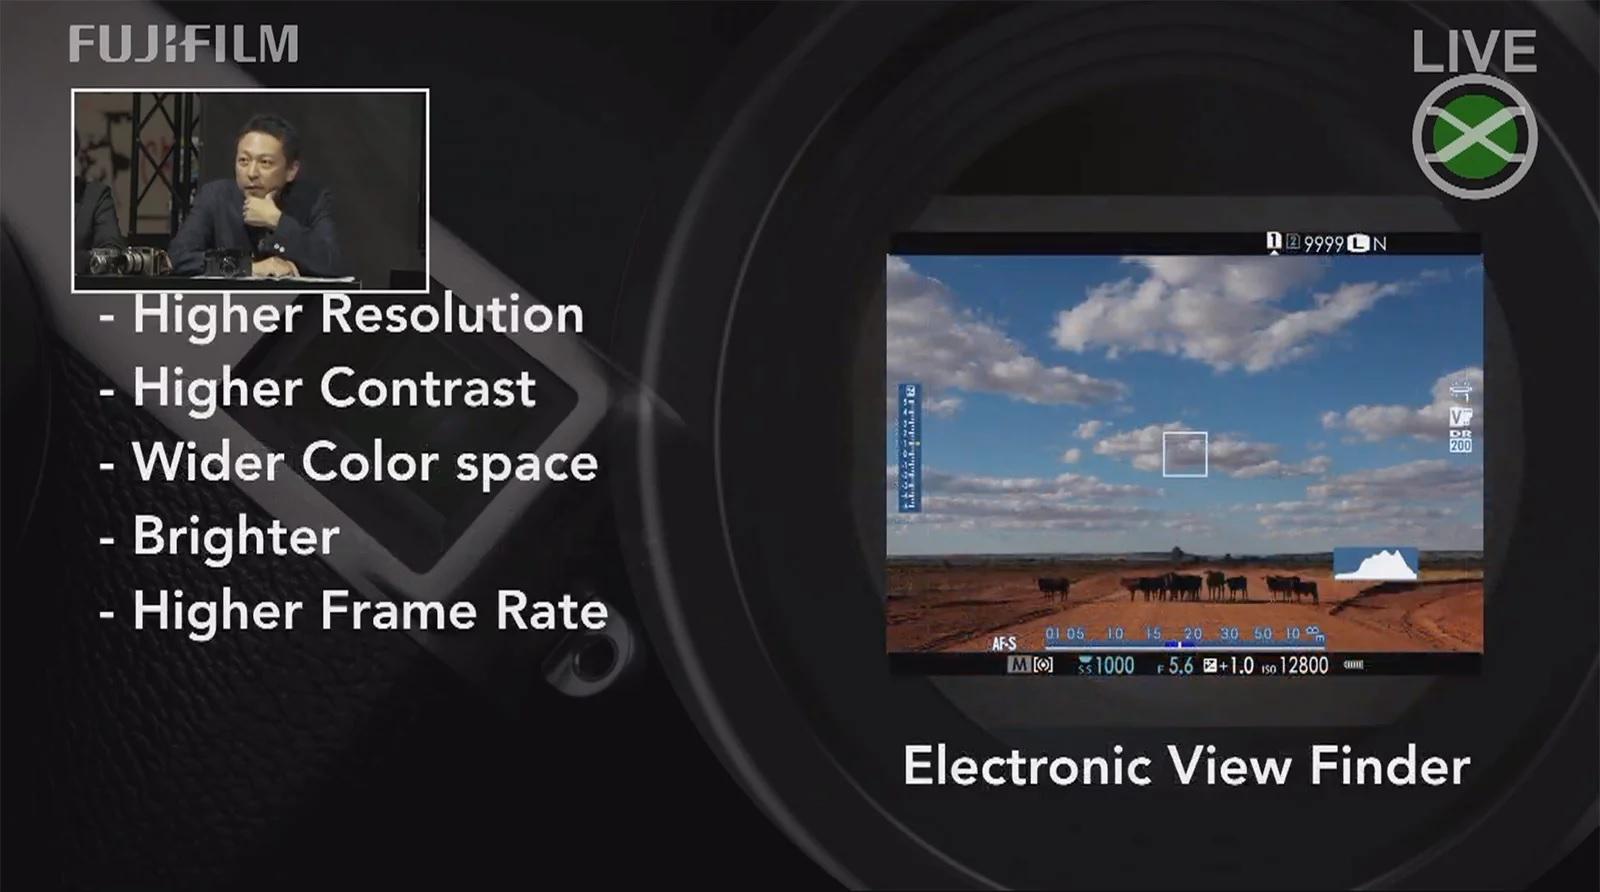 Fujifilm анонсировала разработку X-Pro3